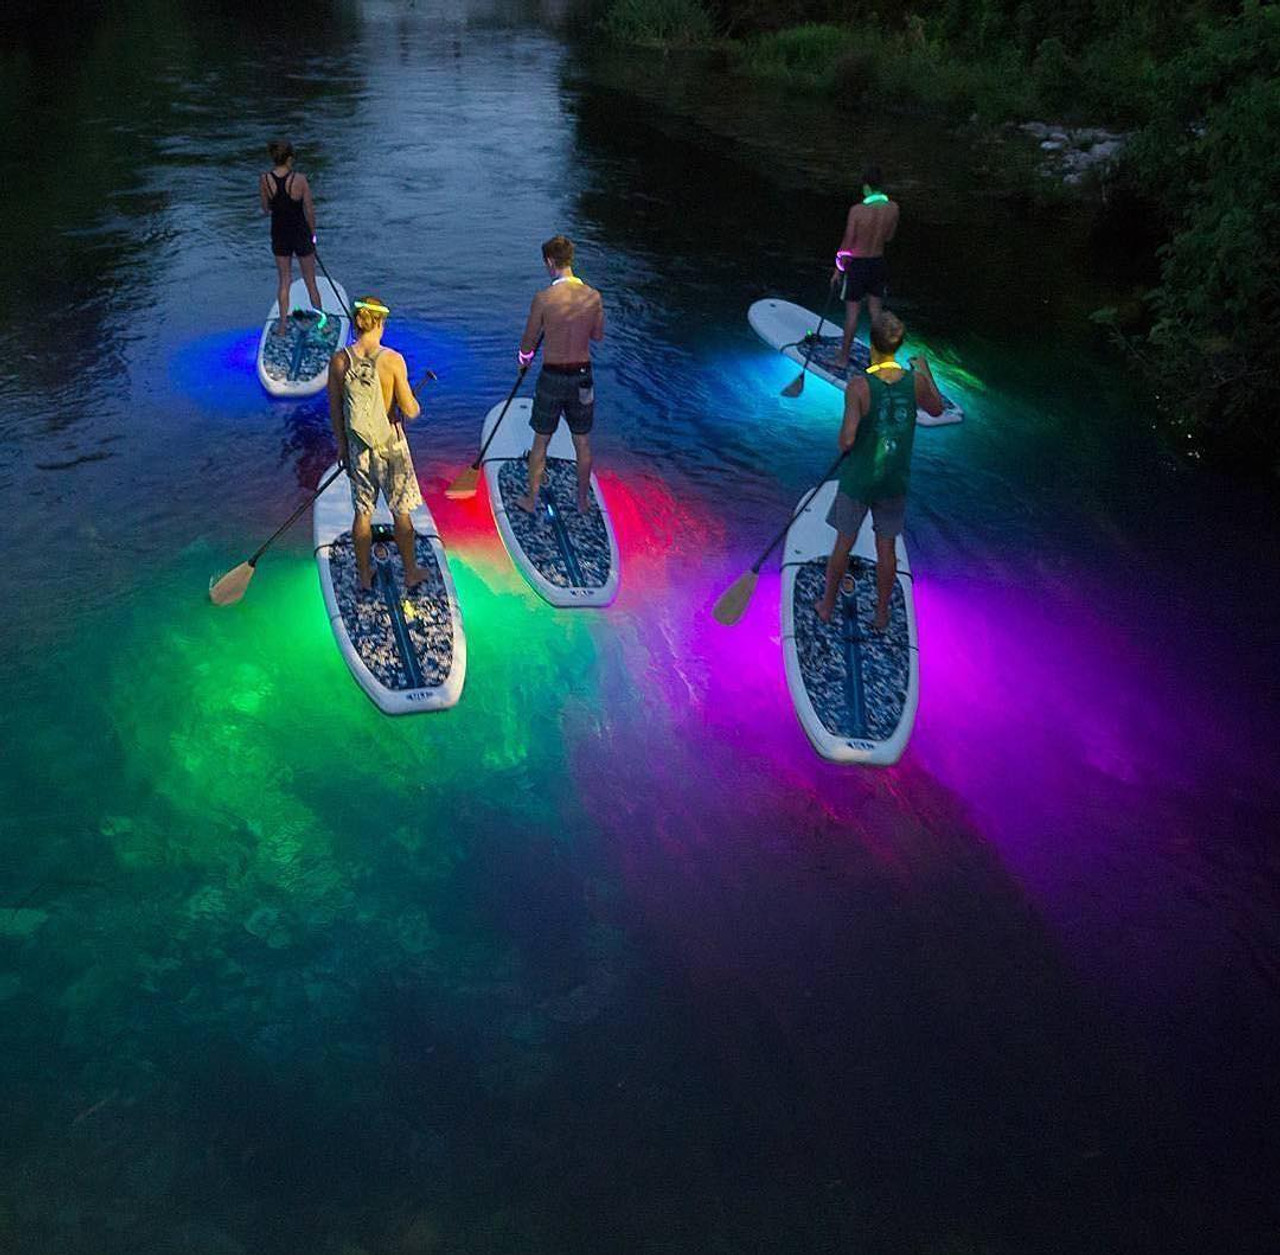 Nocqua Pro Spectrum Sup Light Kit Multi Color Leds